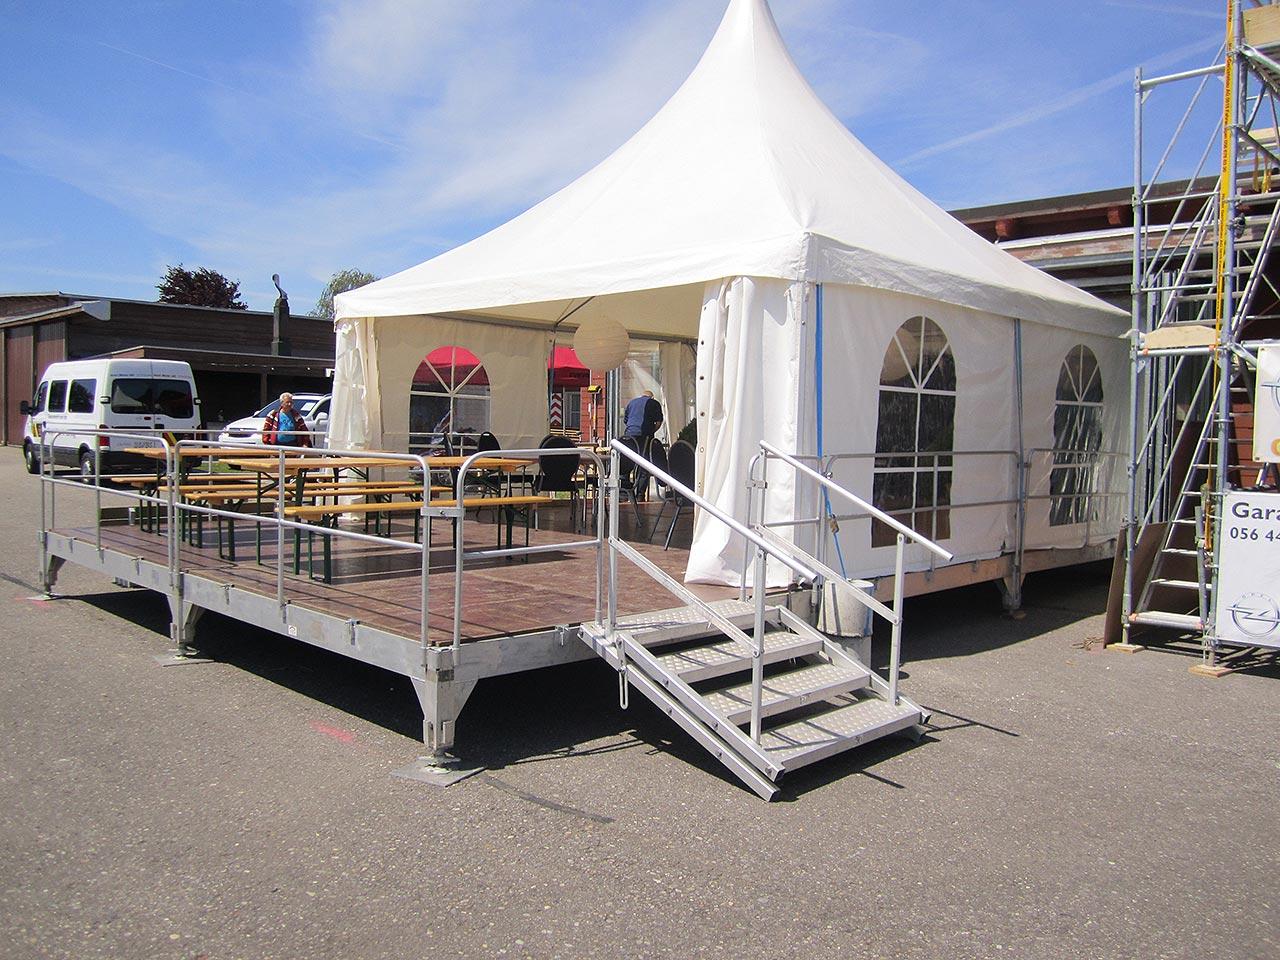 Festmobiliar Festzelte Pagode auf Bühne